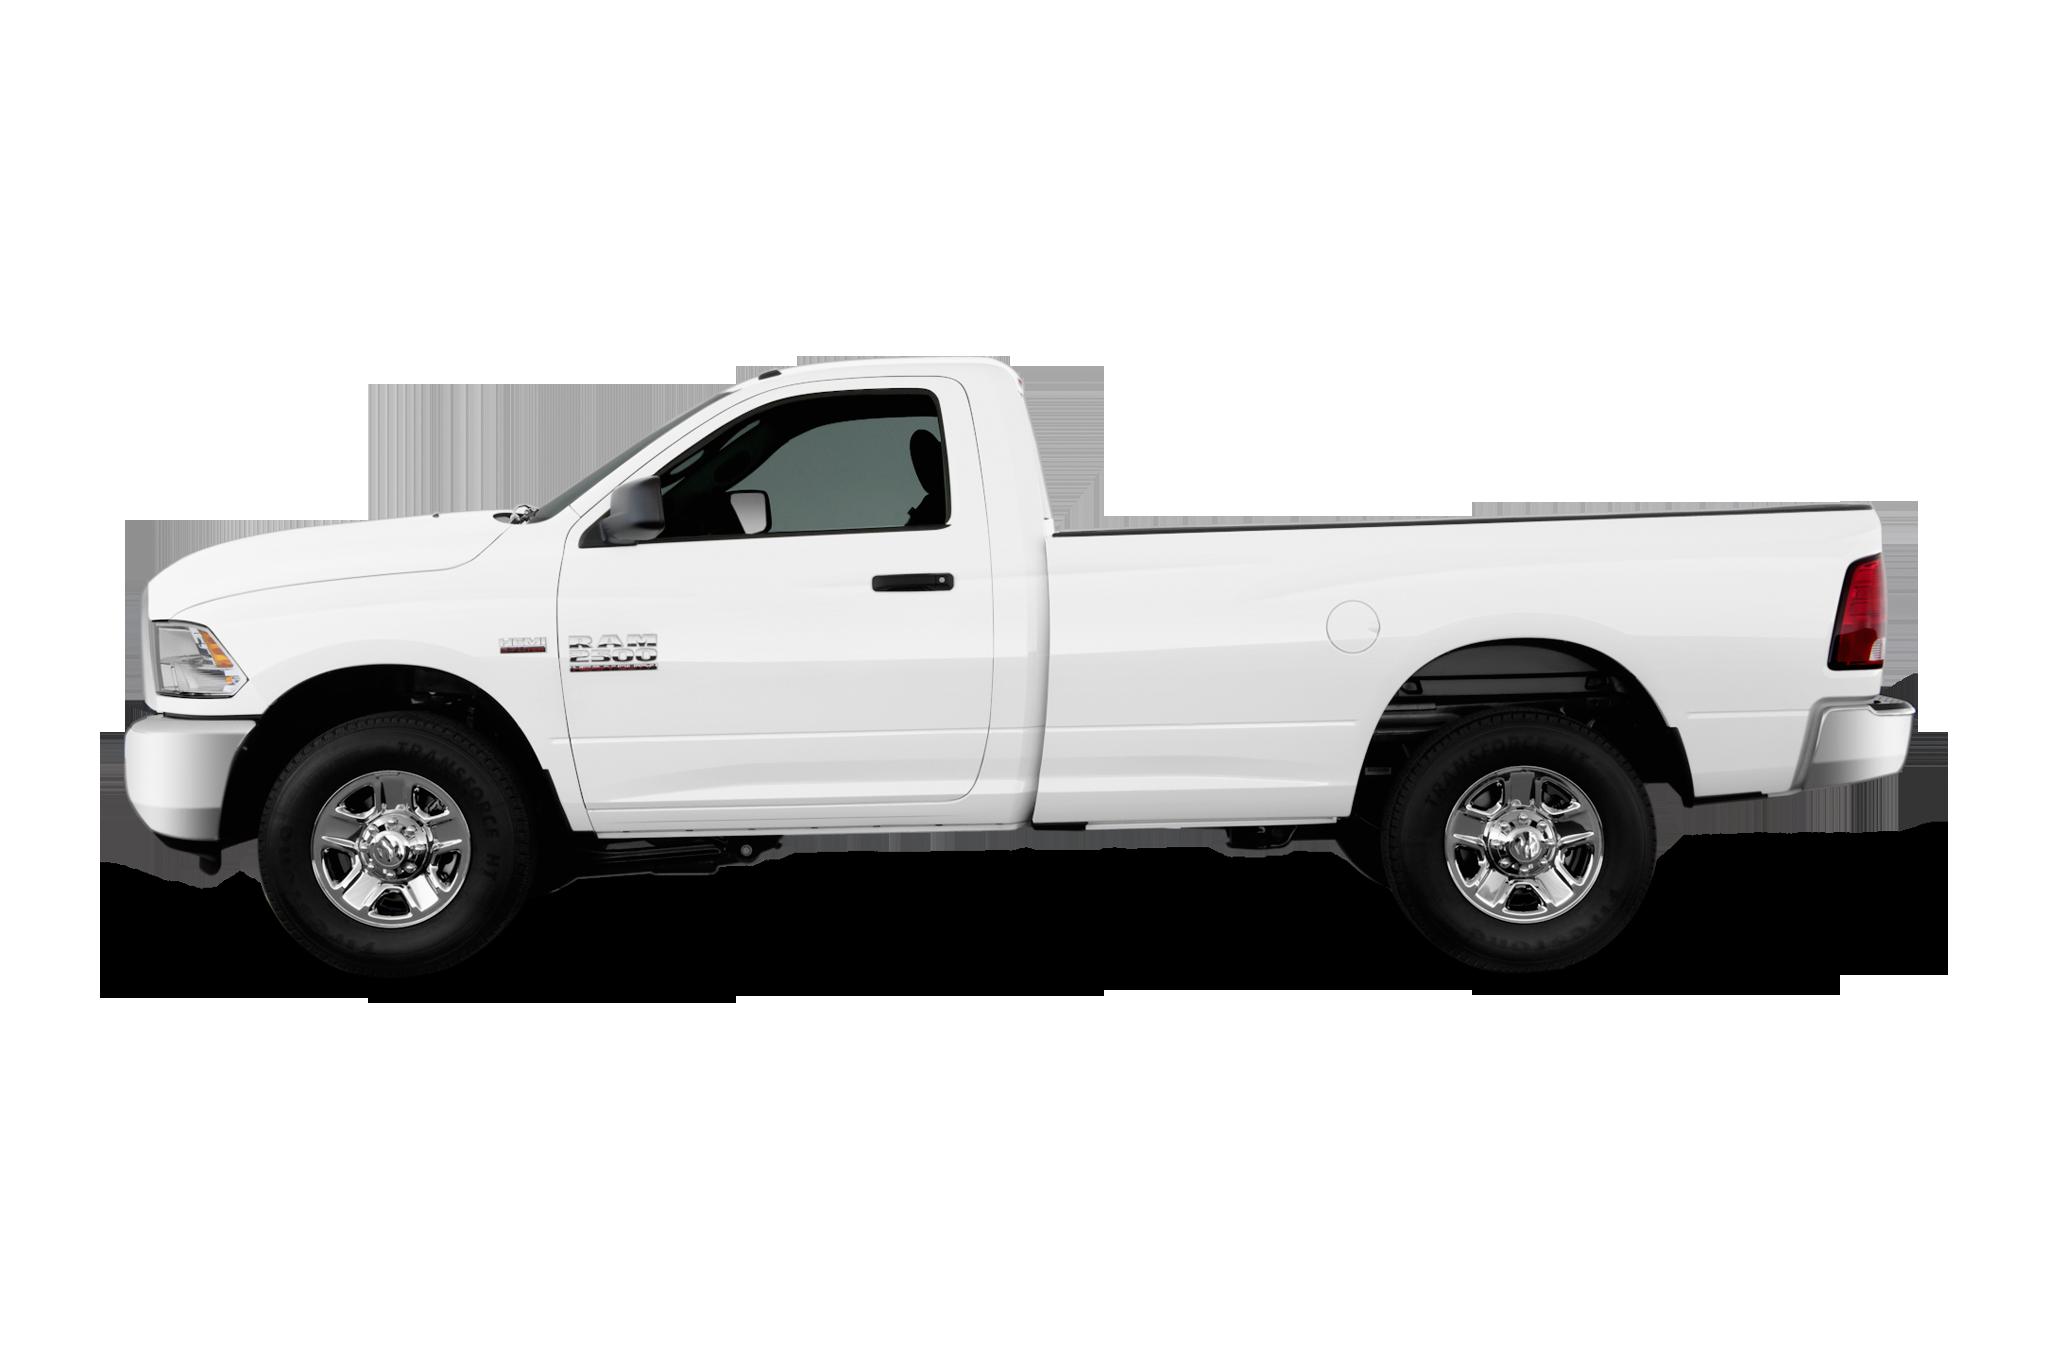 2015 Dodge Ram 2500 Truck - Pickup HD PNG